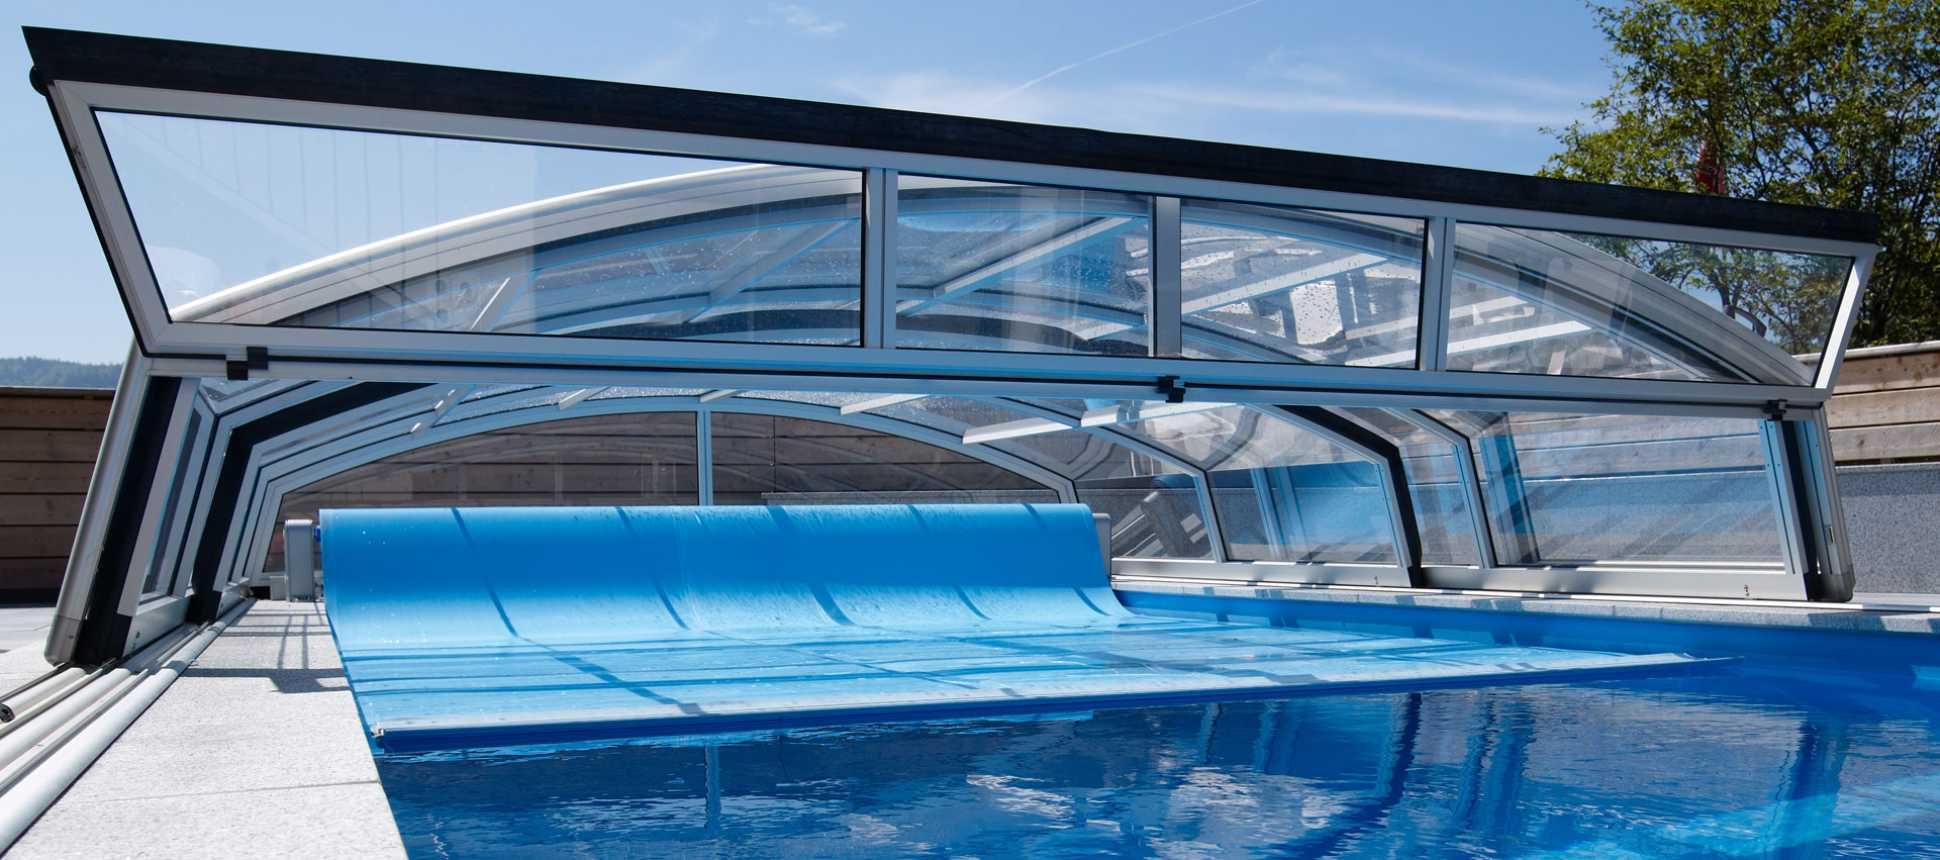 Poolüberdachung Swimmingpool Dach